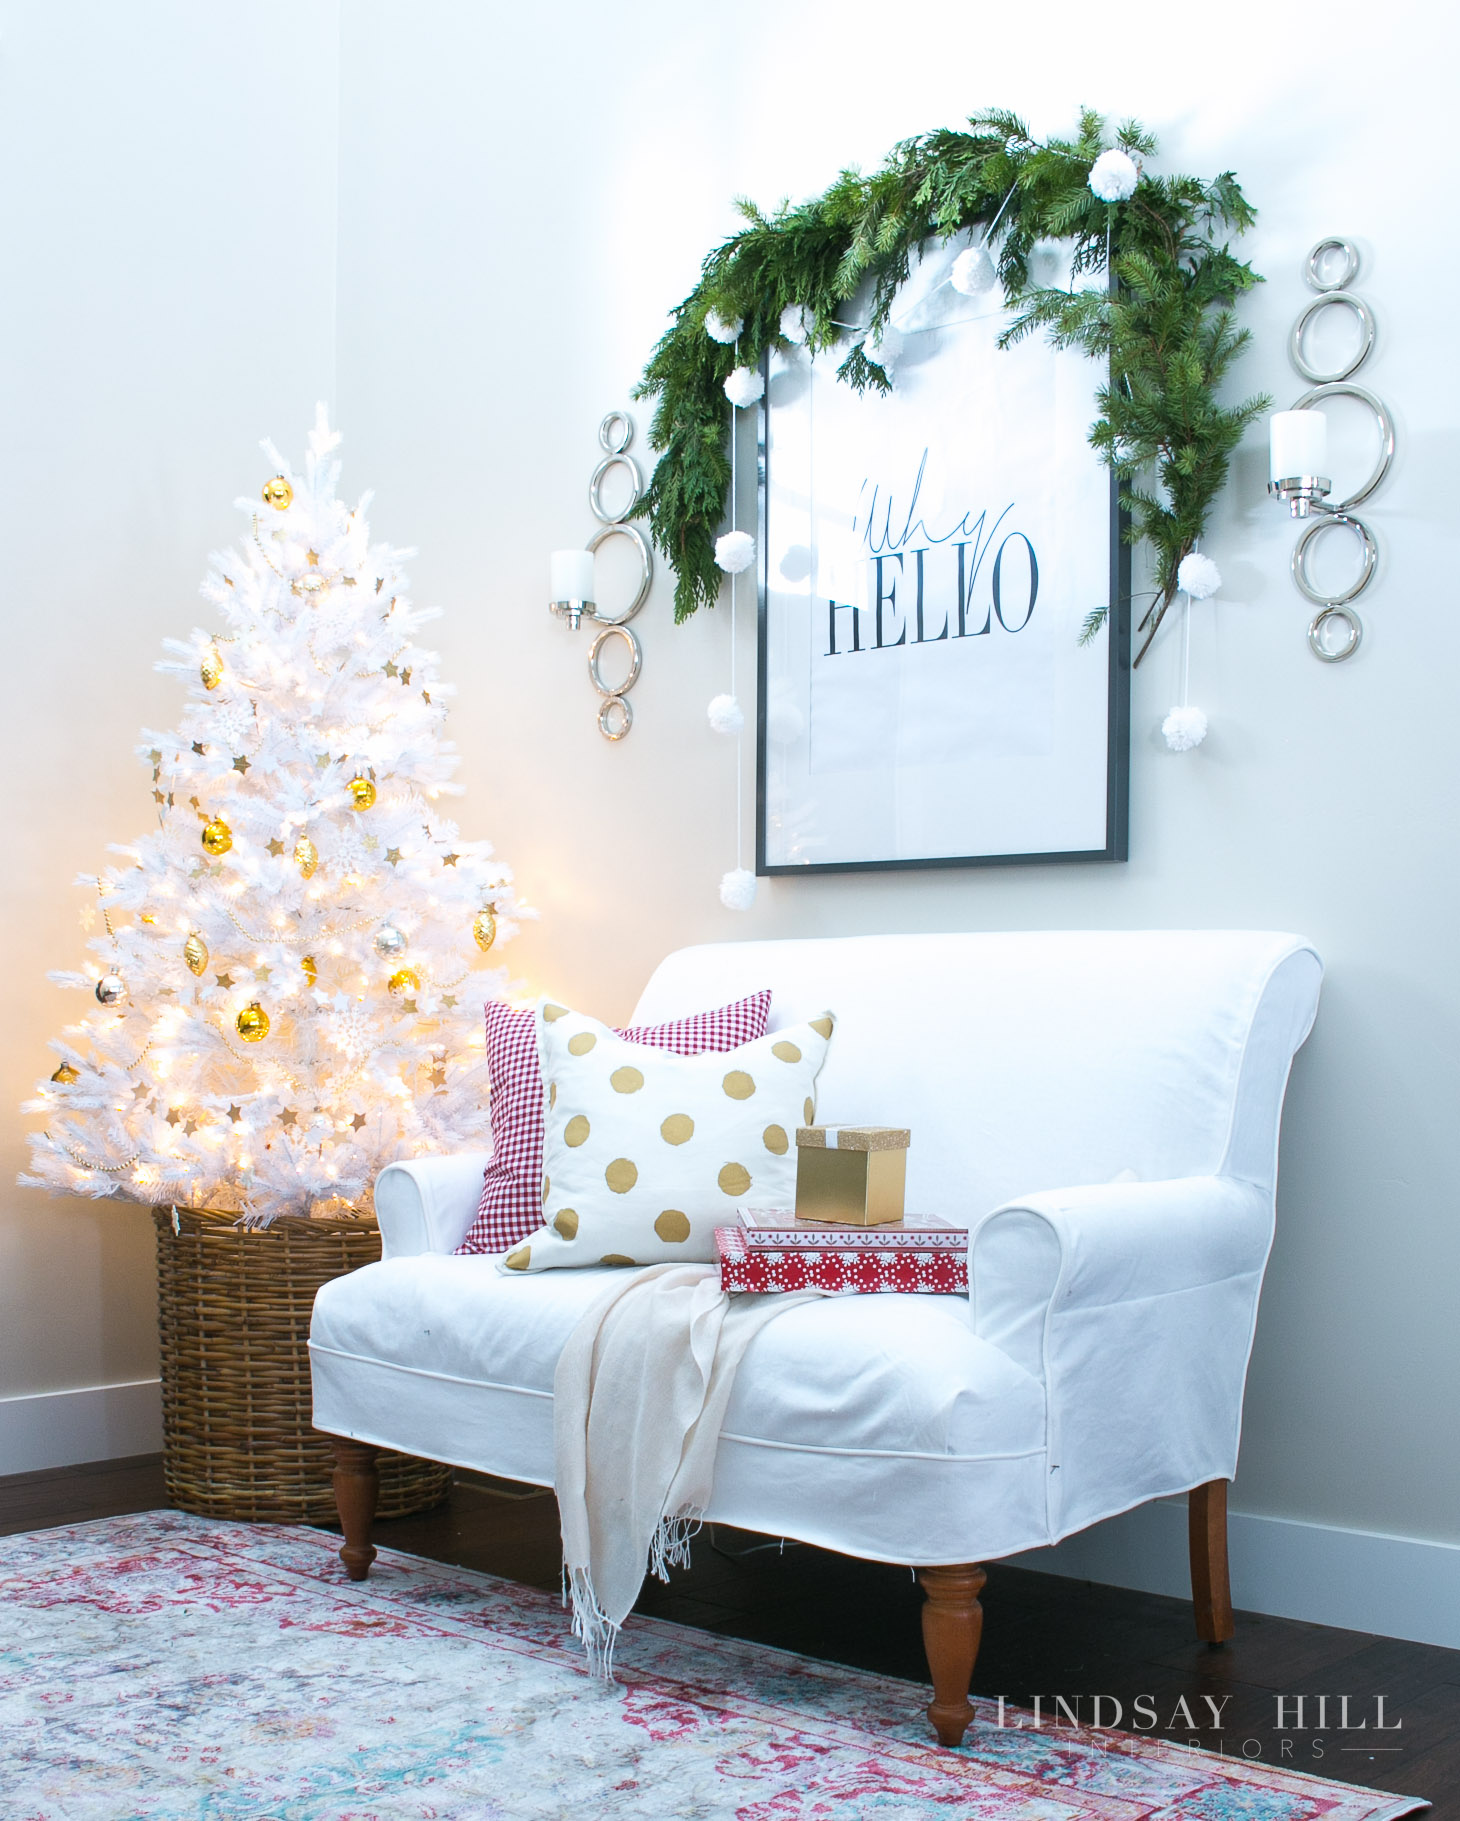 lindsay hill interiors holiday entryway